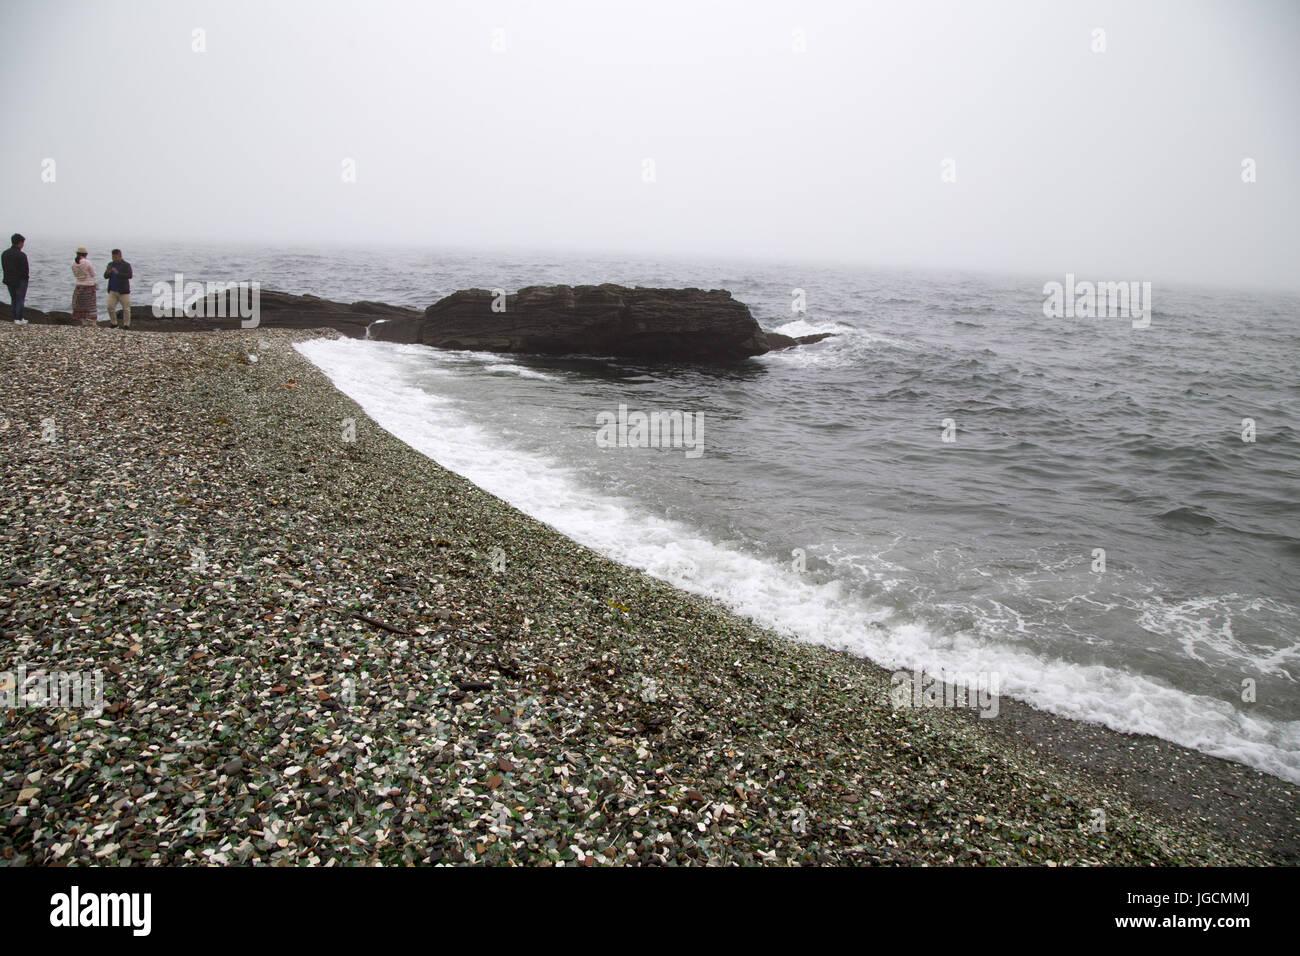 Vladivostok, Vladivostok, China. 6th July, 2017. Vladivostok, Russia -June 29 2017: (EDITORIAL USE ONLY. CHINA OUT) - Stock Image